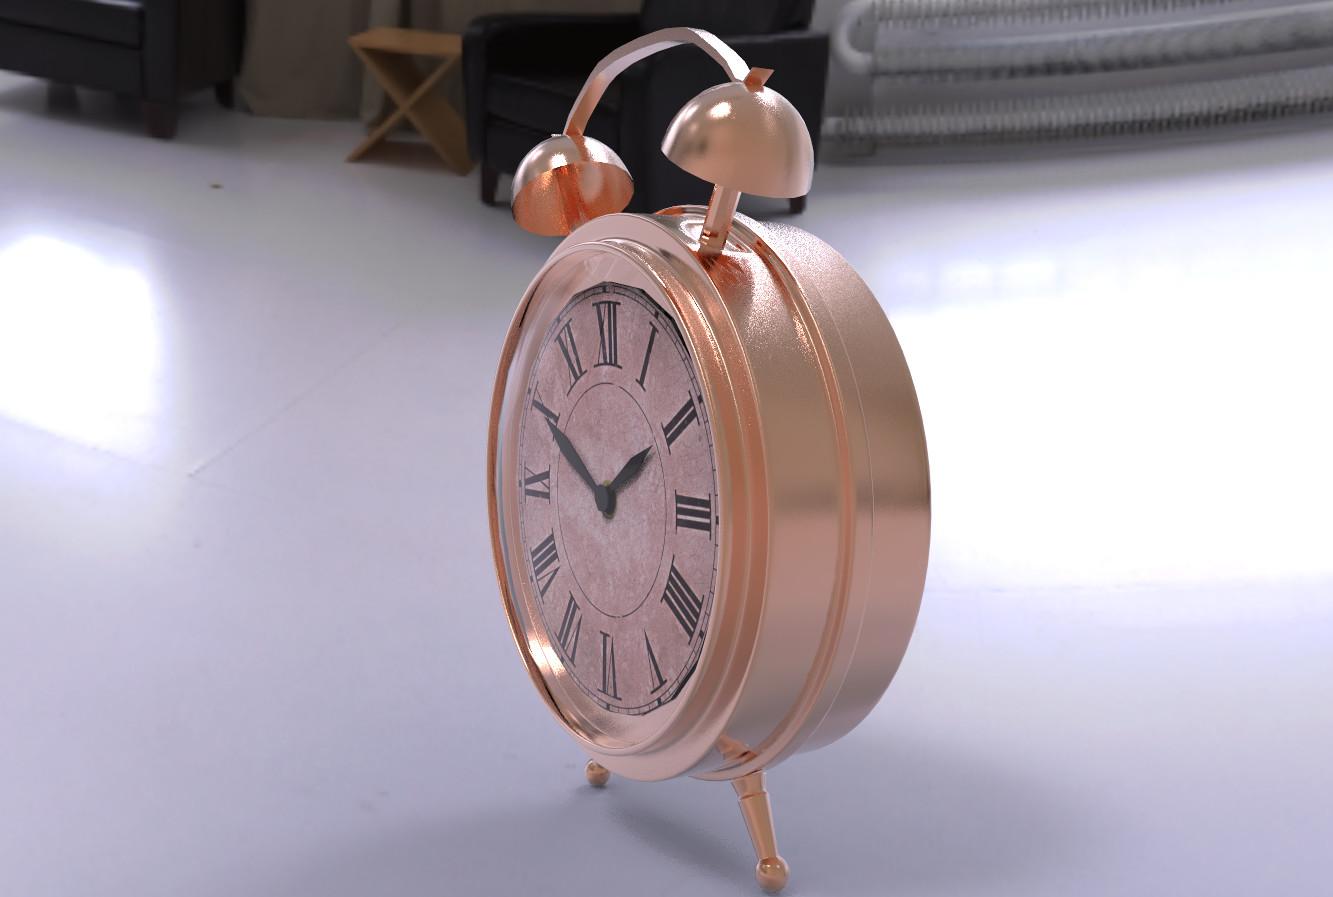 Rajesh sawant old clock 3